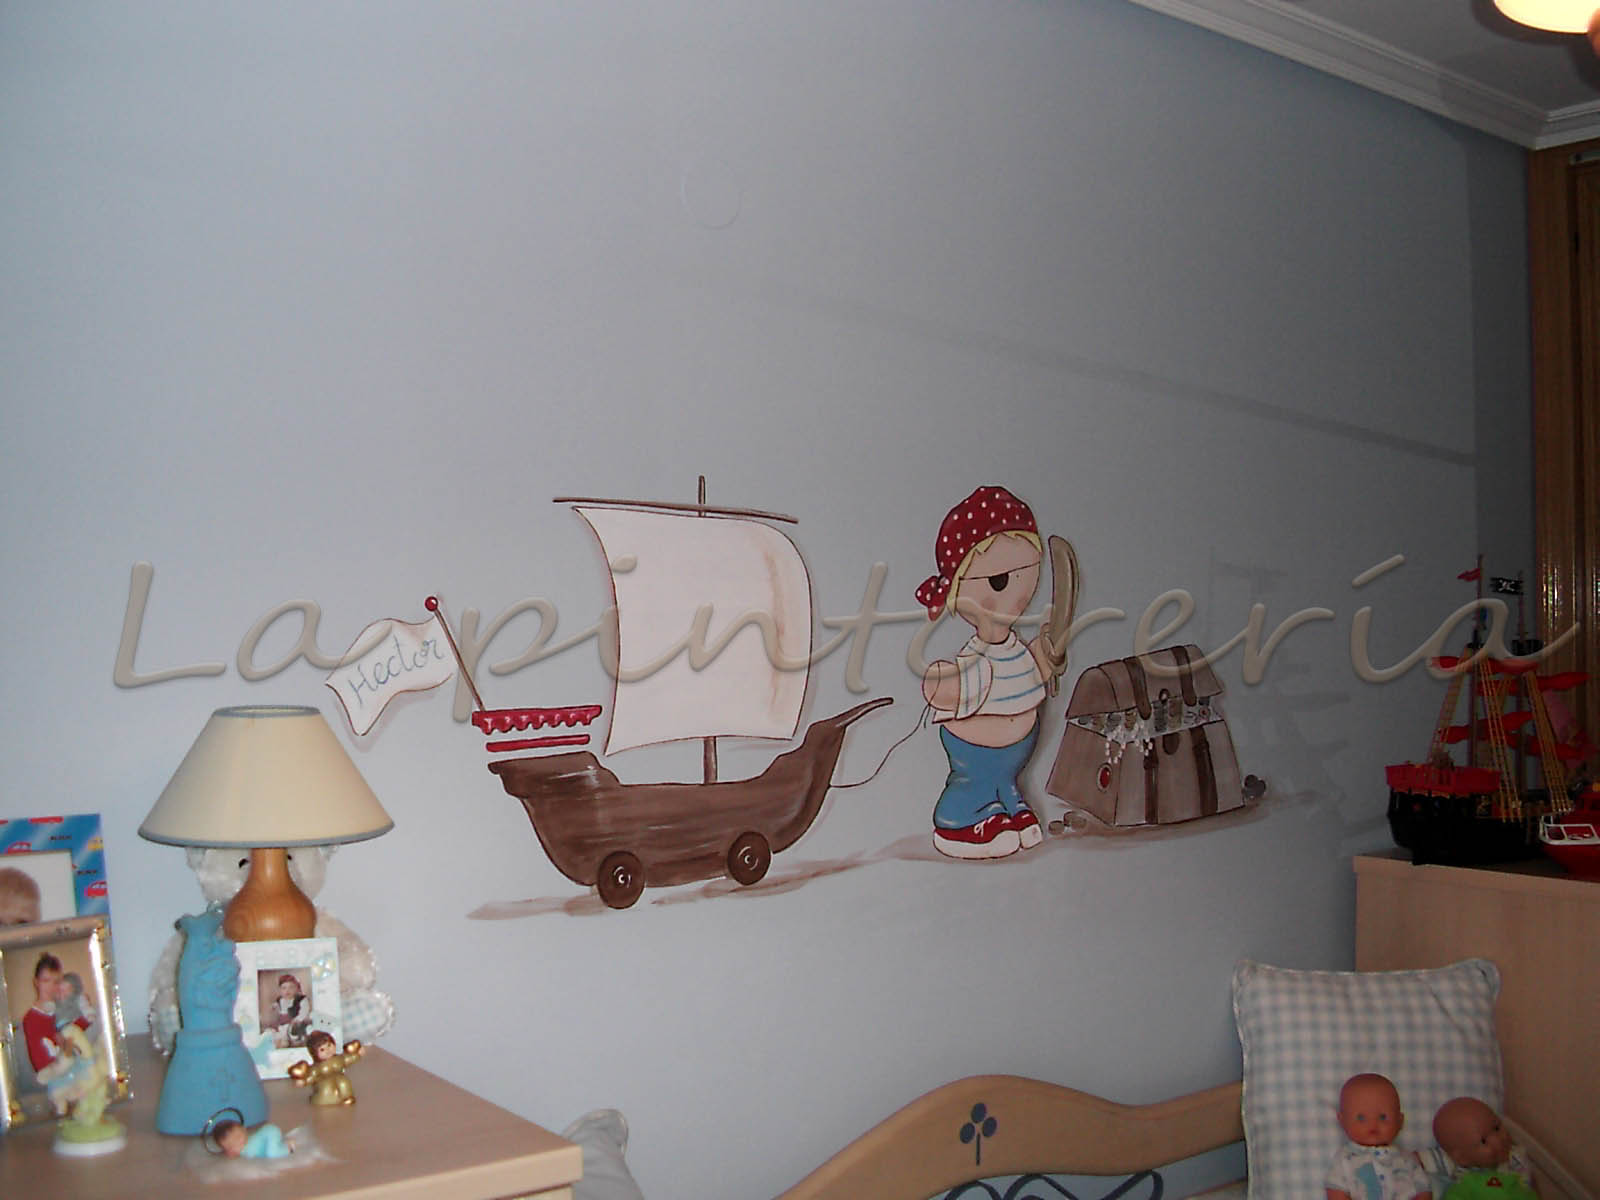 deco chambre b b peinture murale enfant. Black Bedroom Furniture Sets. Home Design Ideas